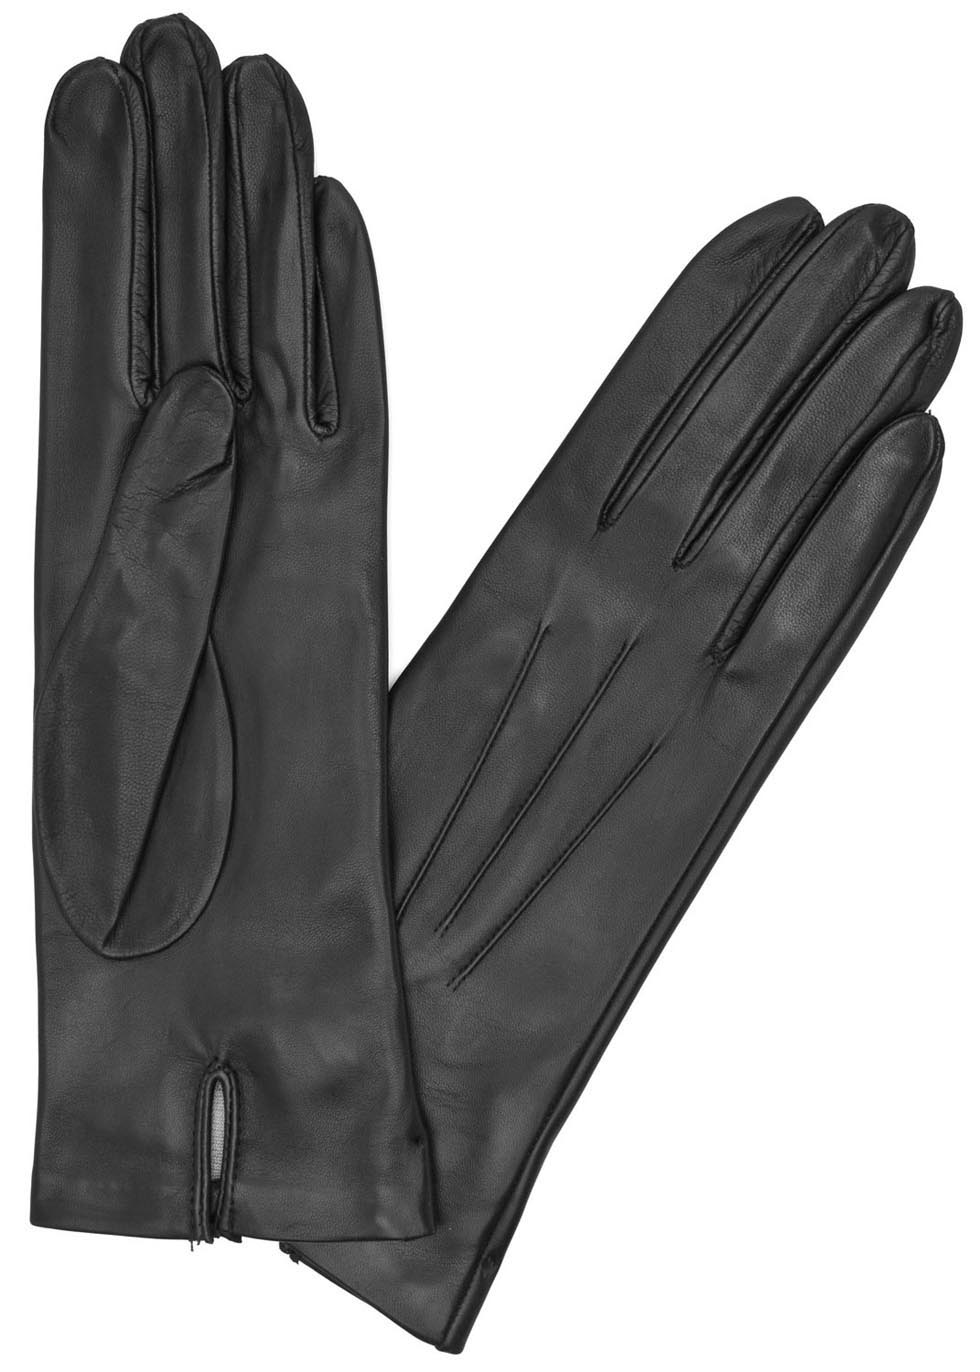 Black silk-lined leather gloves - Dents